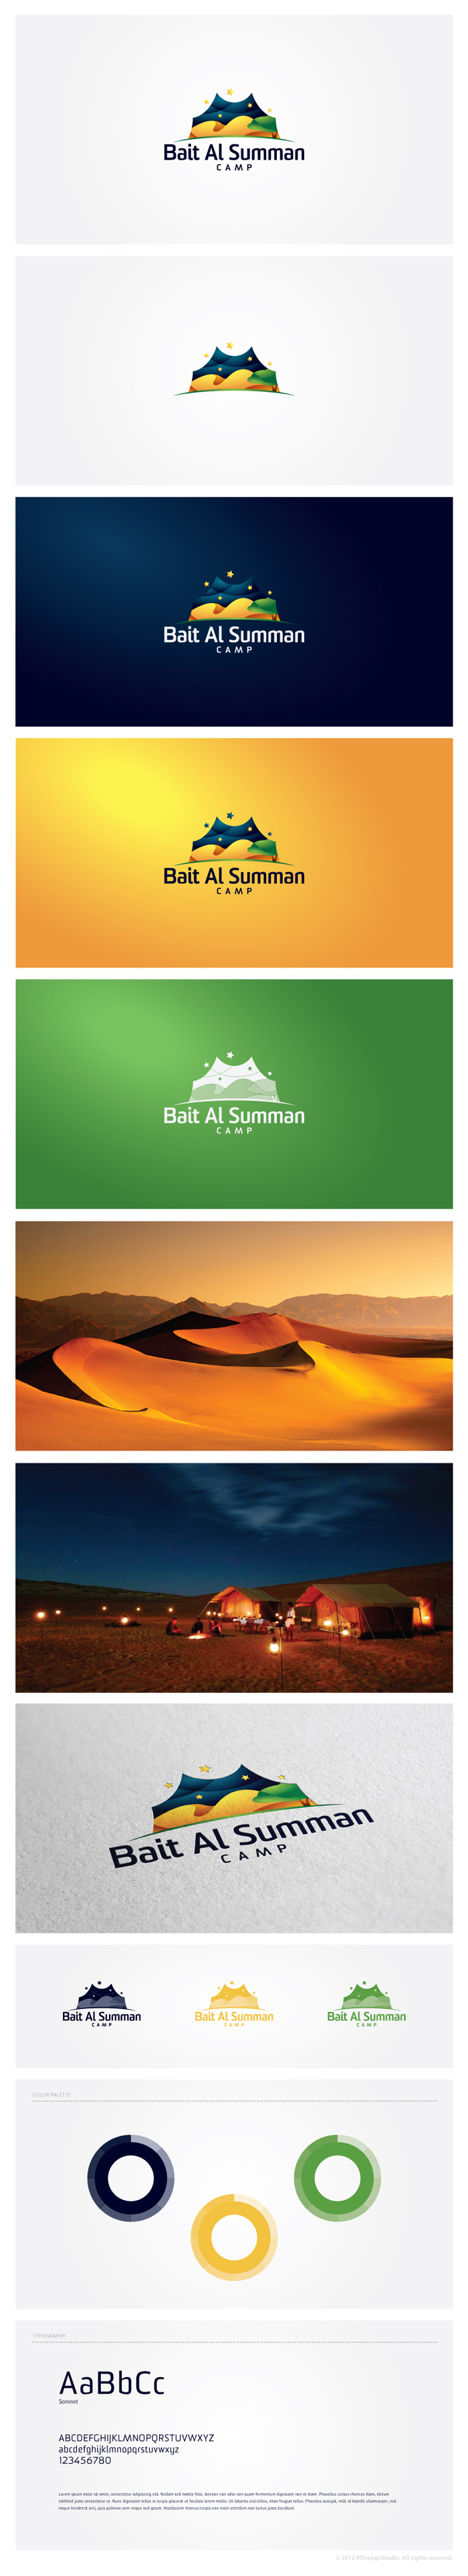 Bait Al Summan